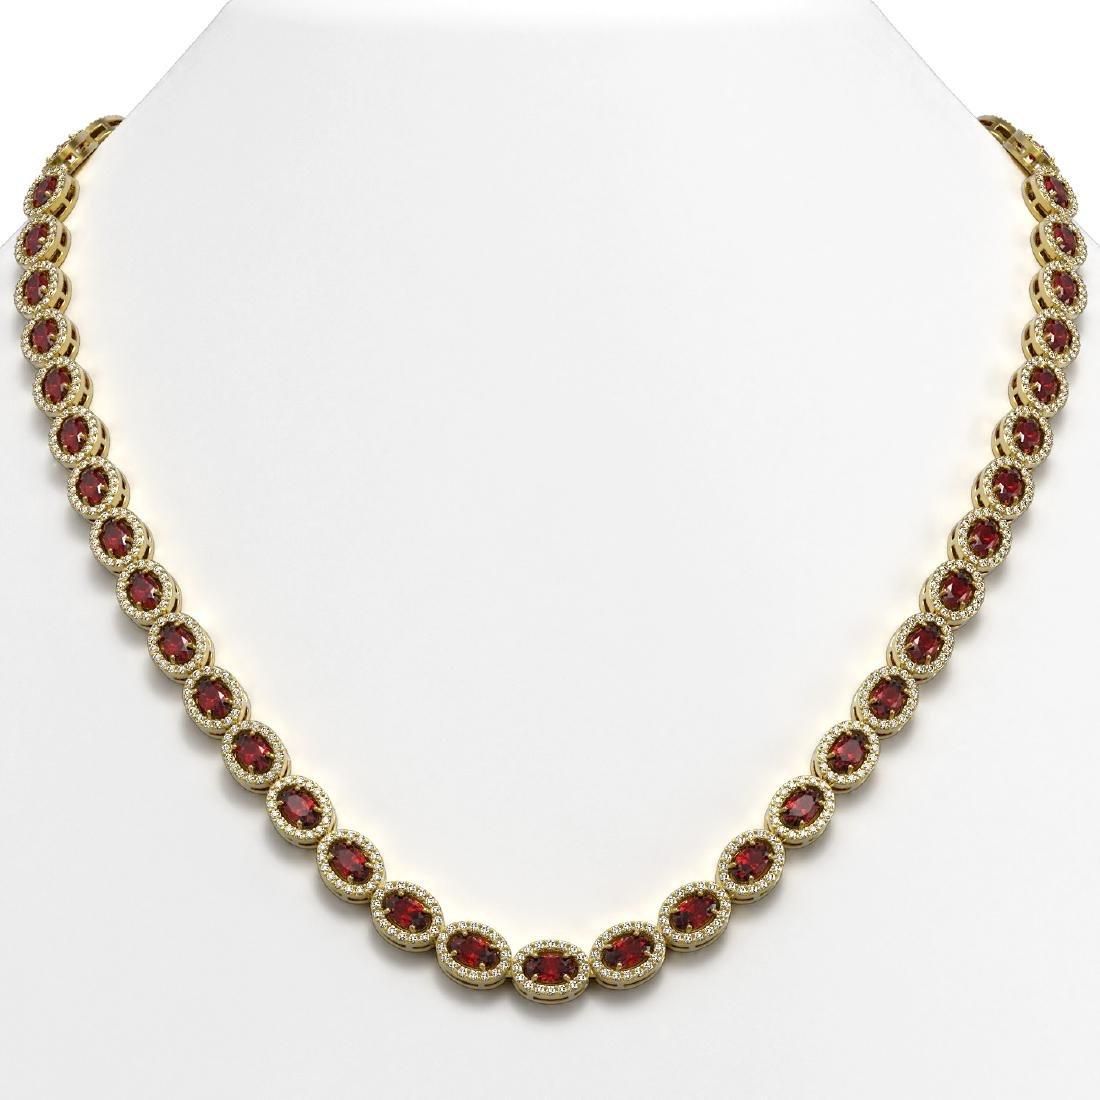 21.04 CTW Garnet & Diamond Halo Necklace 10K Yellow